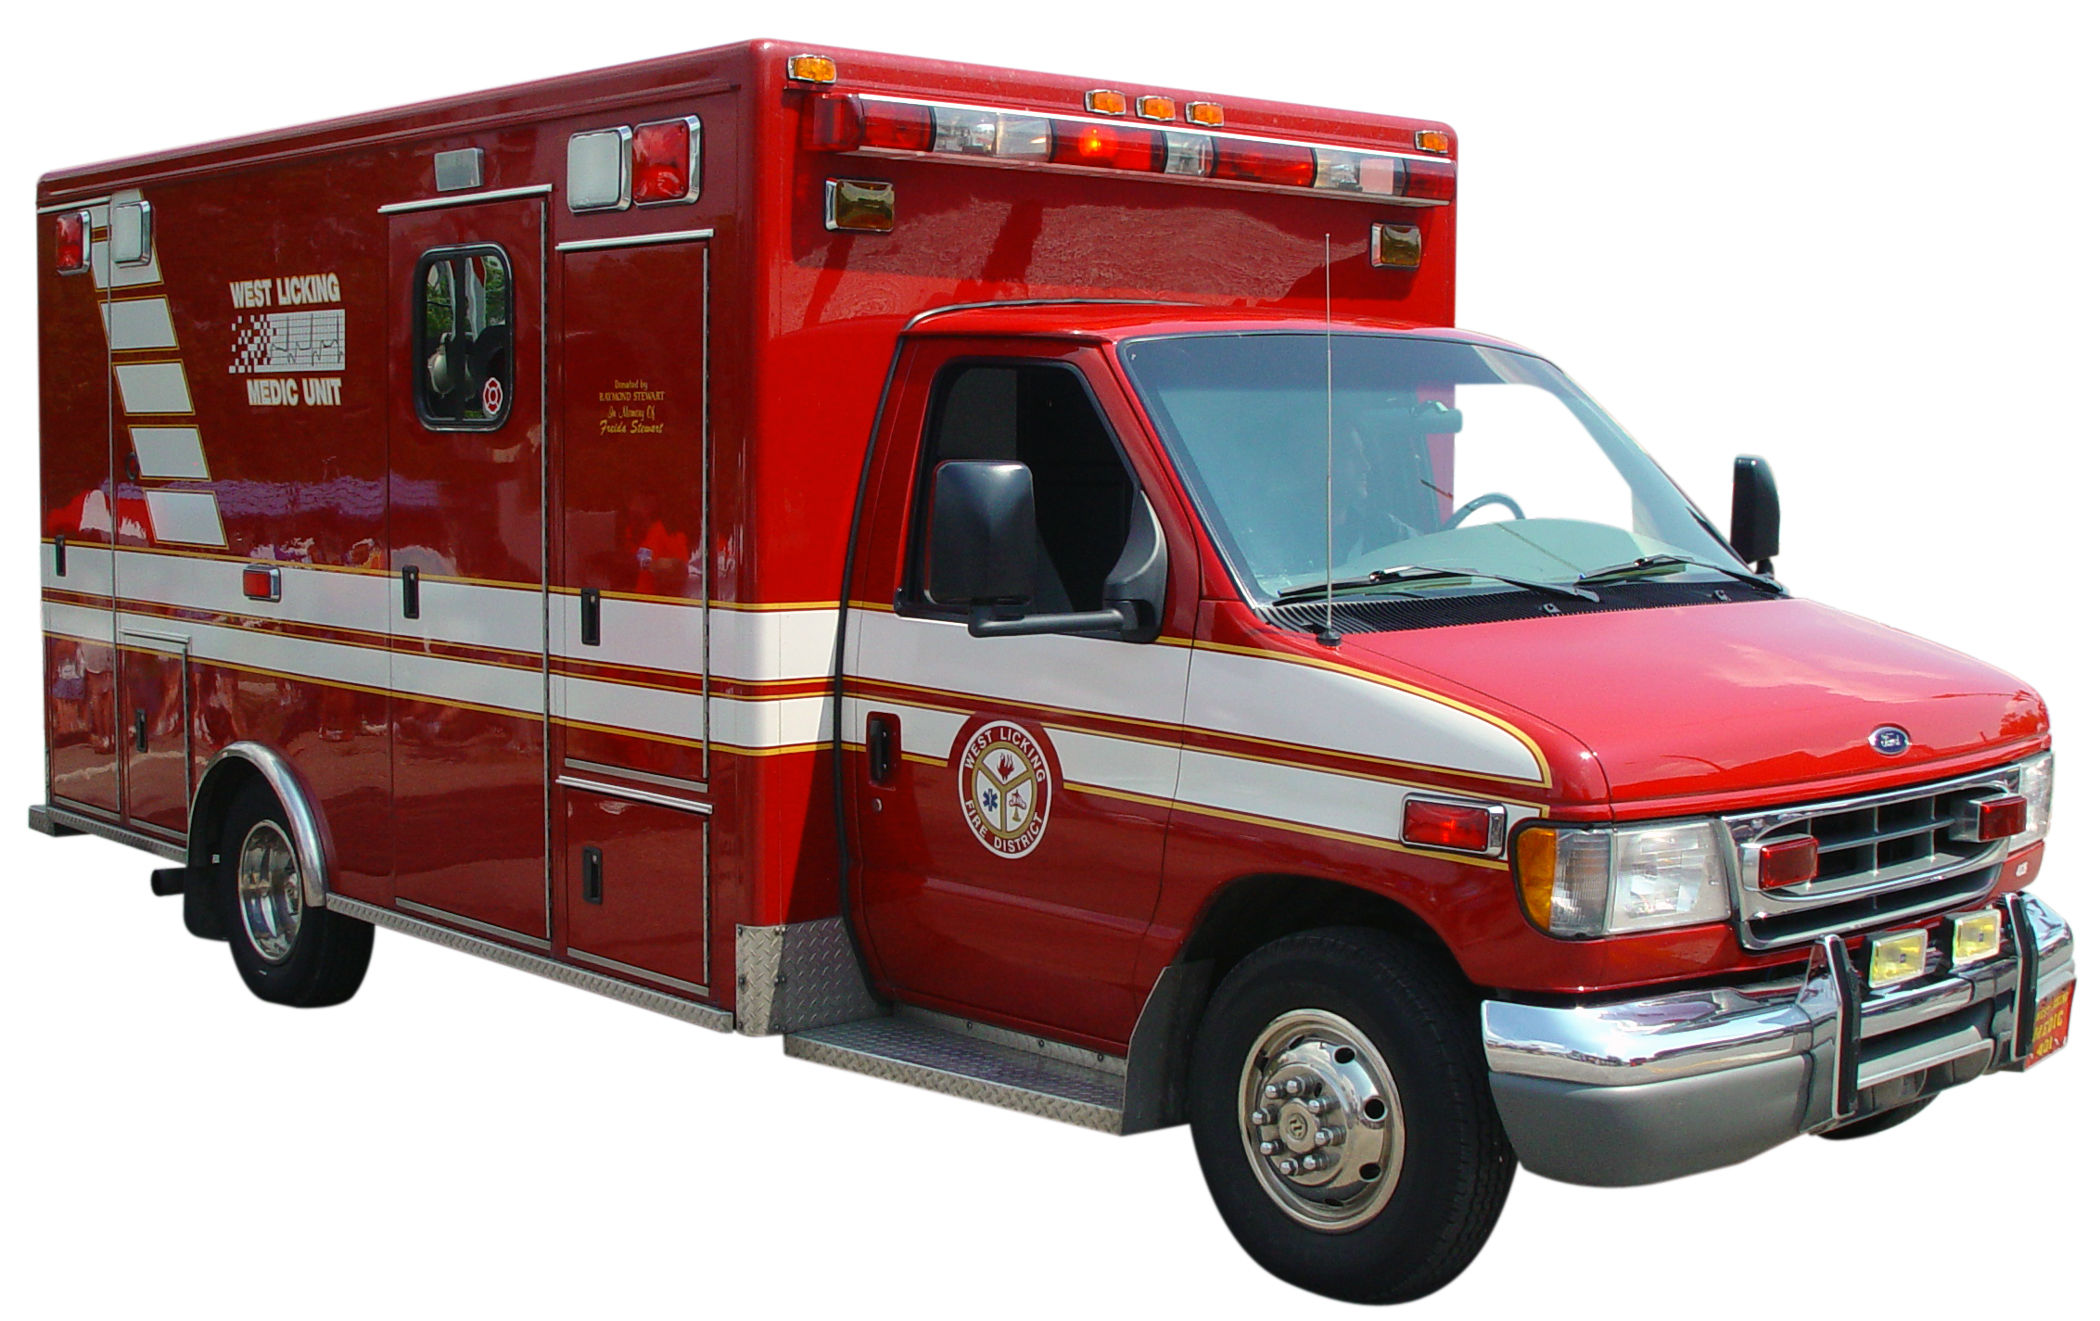 Recent Decision Clarifies Liability Of 911 Operators